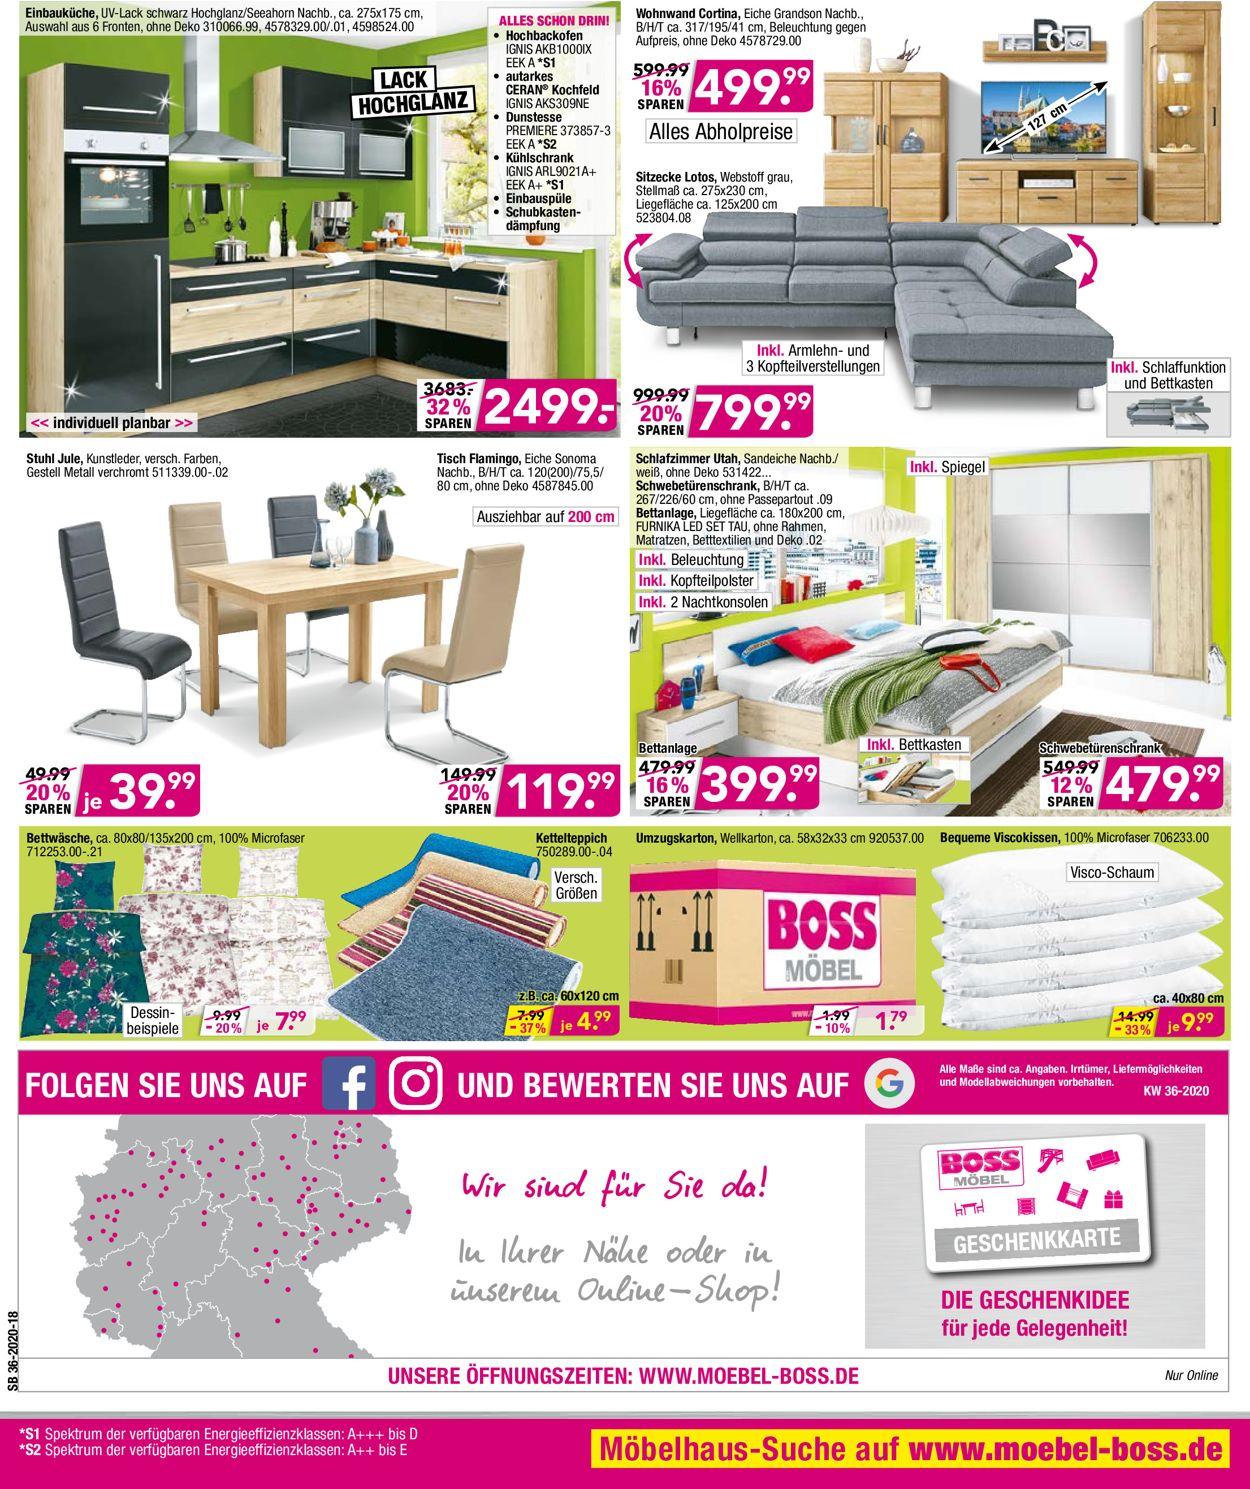 SB Möbel Boss Prospekt - Aktuell vom 31.08-06.09.2020 (Seite 10)